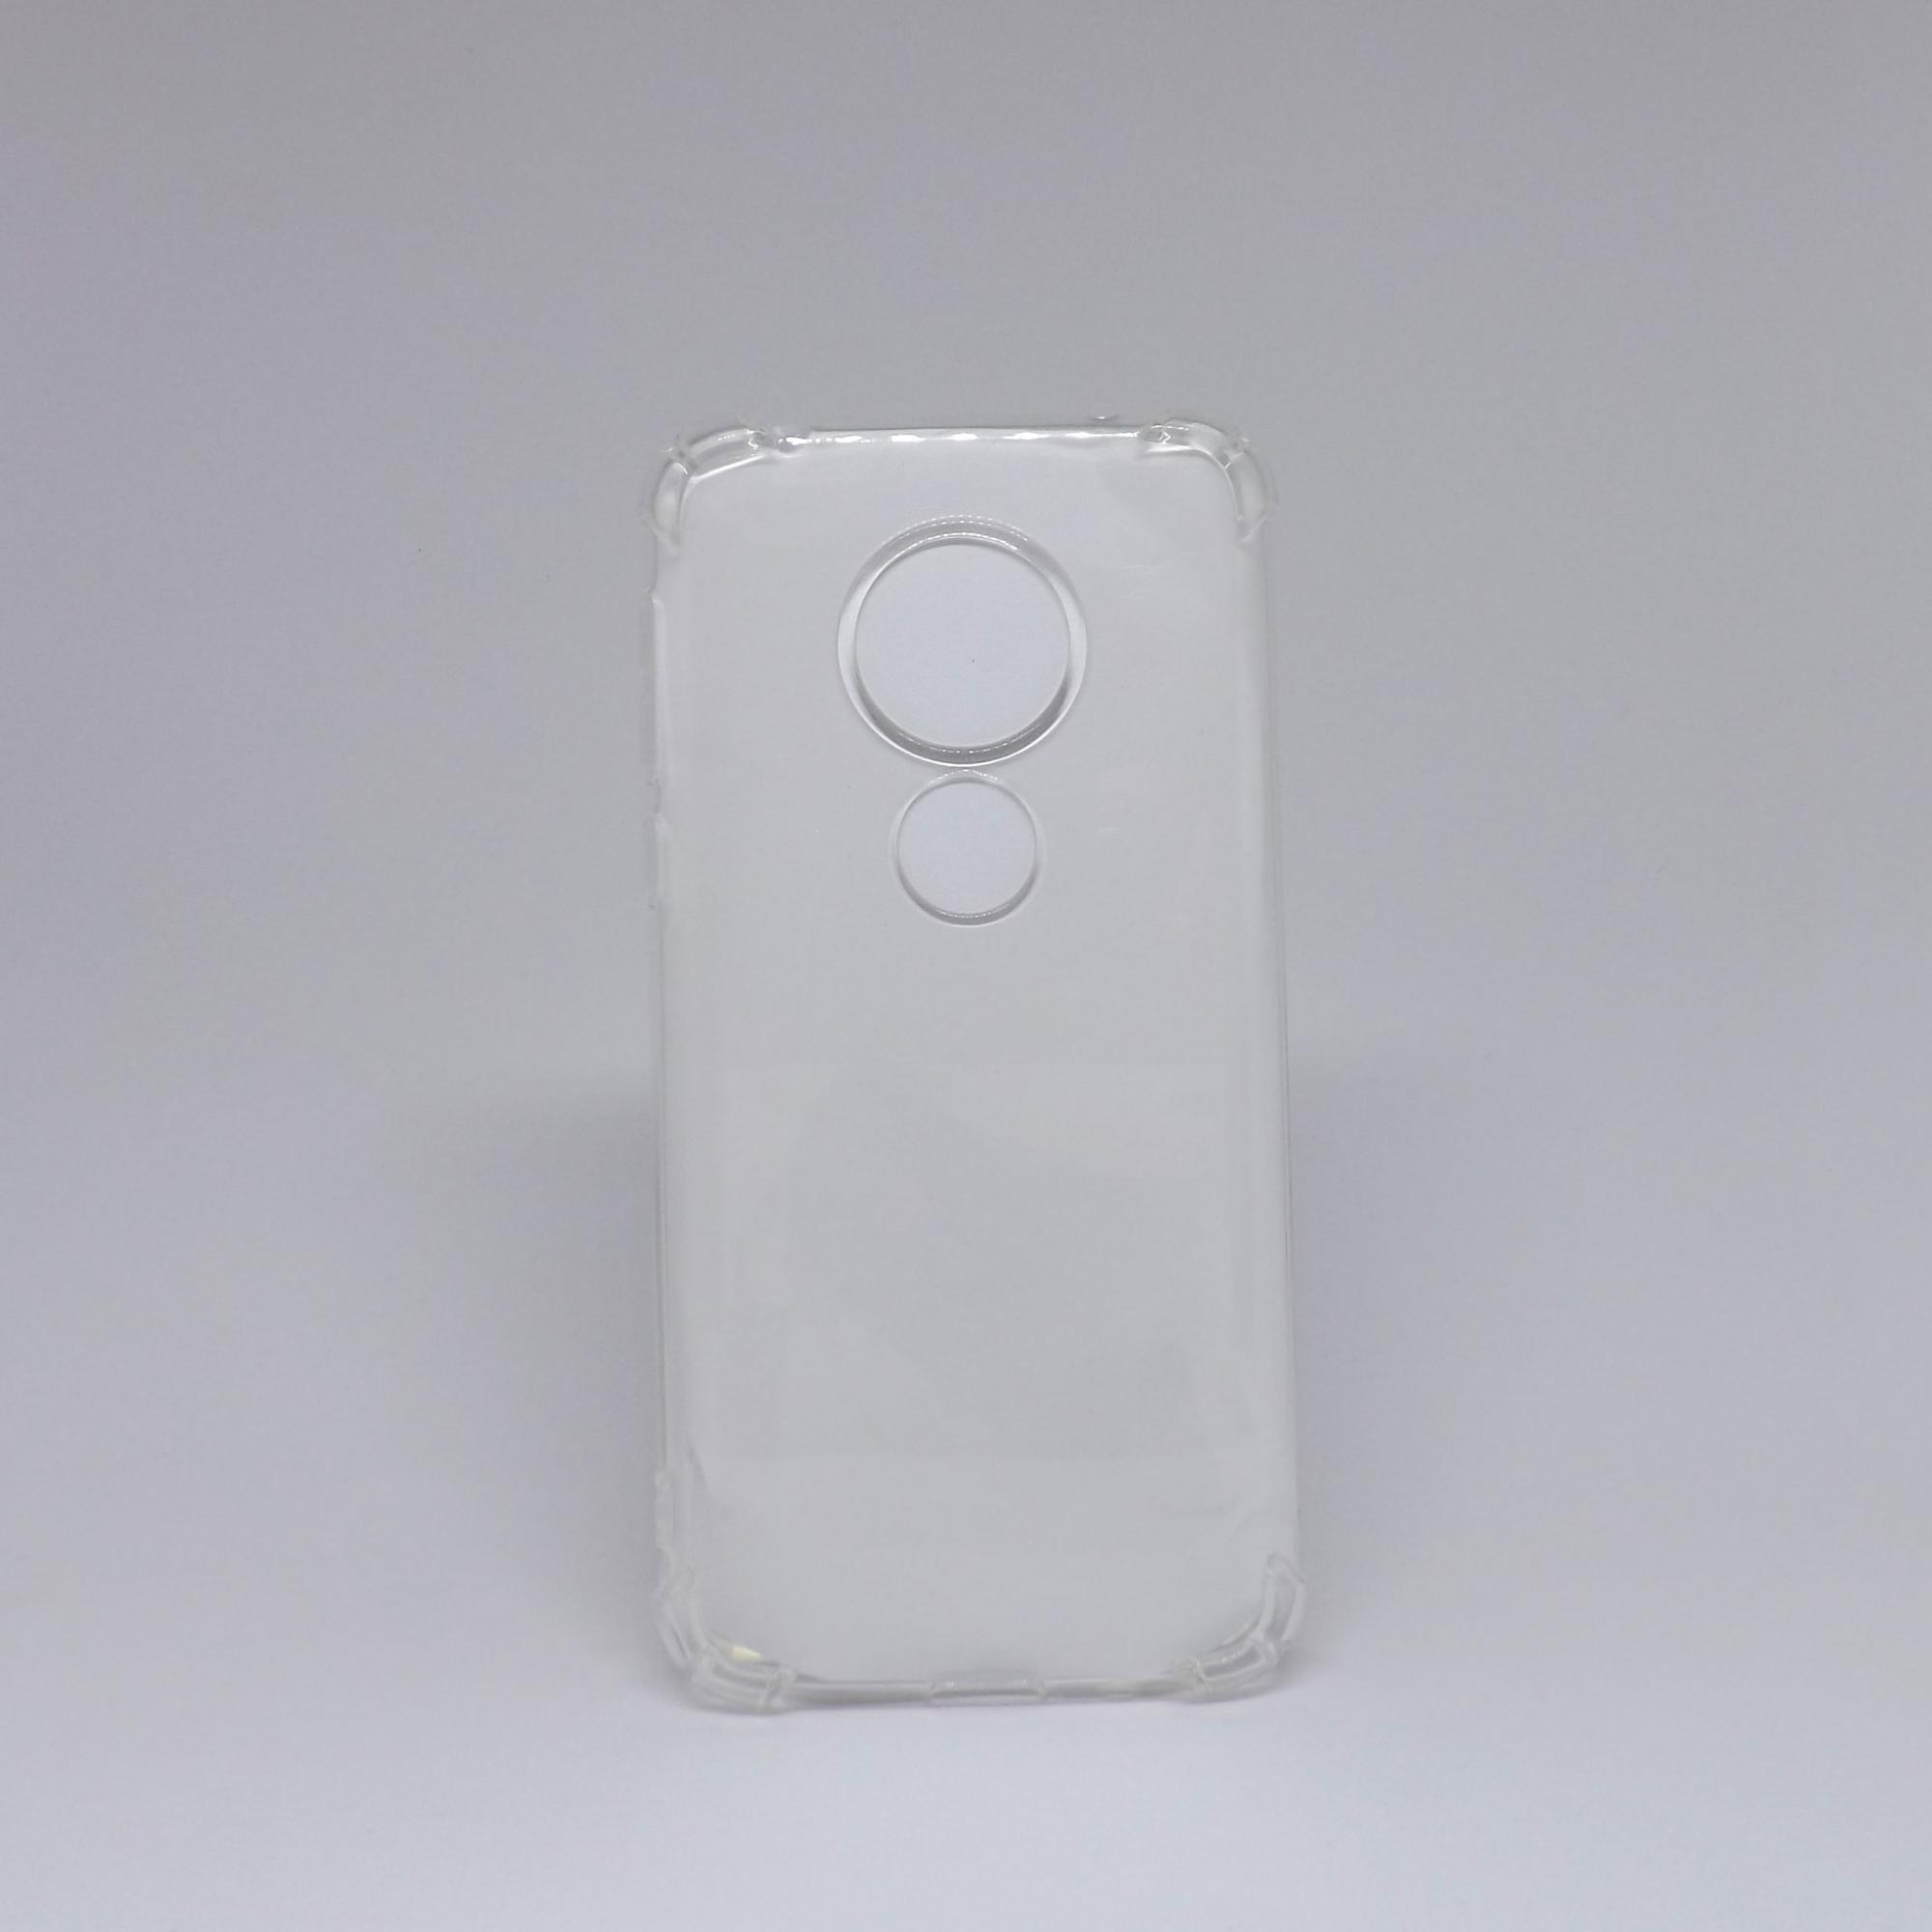 Capa Motorola G7 Play Antiqueda Transparente